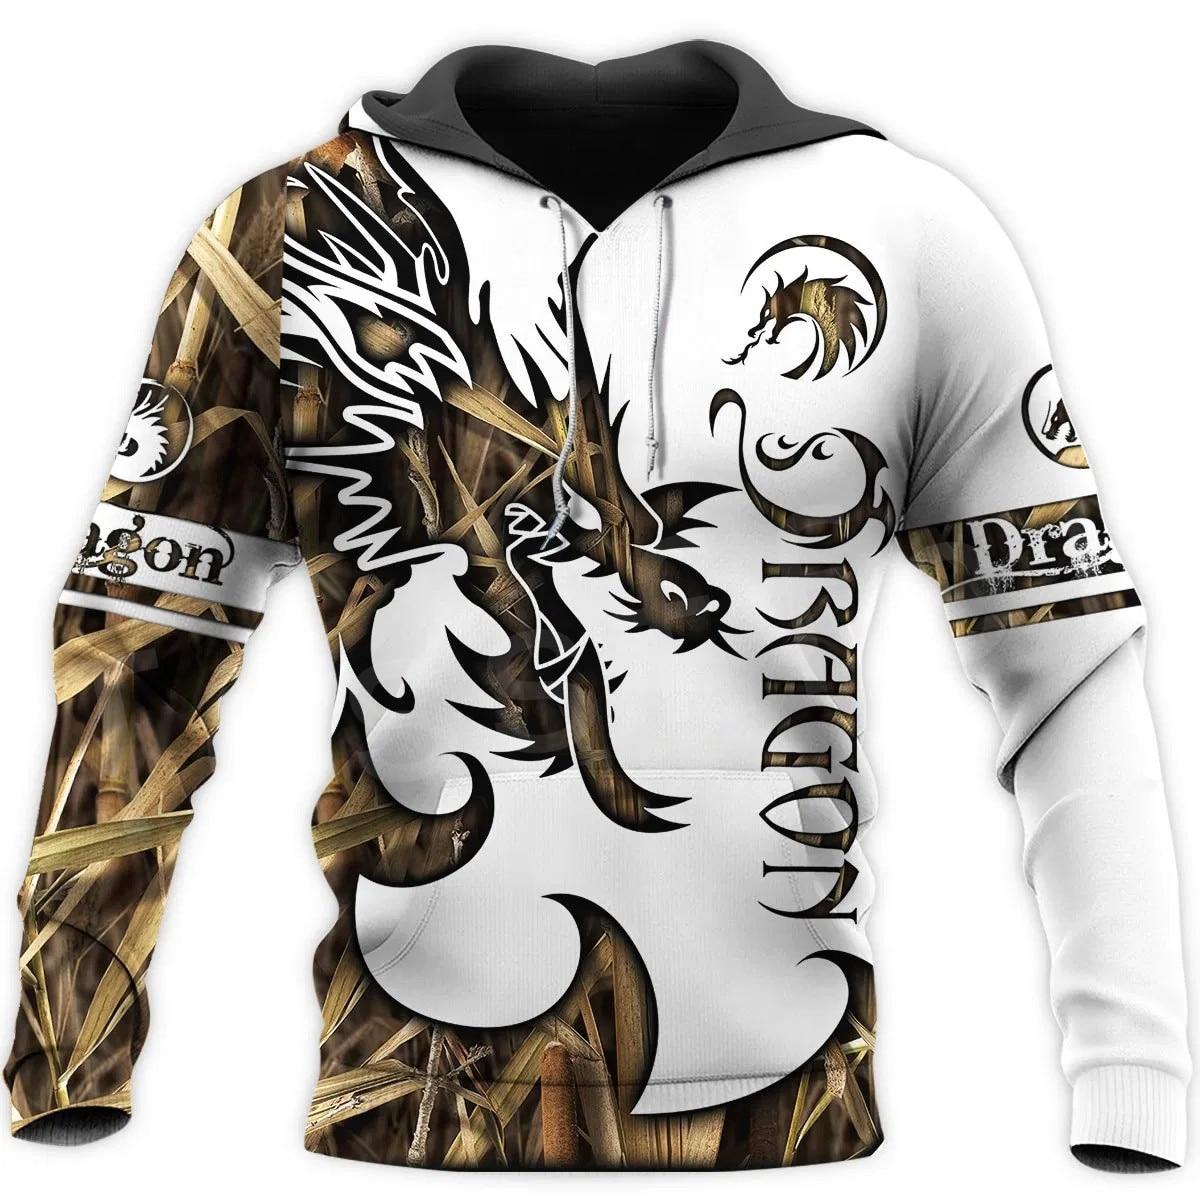 Tessffel Animal Art Fly Dragon Symbol Tattoo Unisex 3DPrint Tracksuit Newfashion Streetwear Zipper/Sweatshirts/Hoodies/Jacket 17